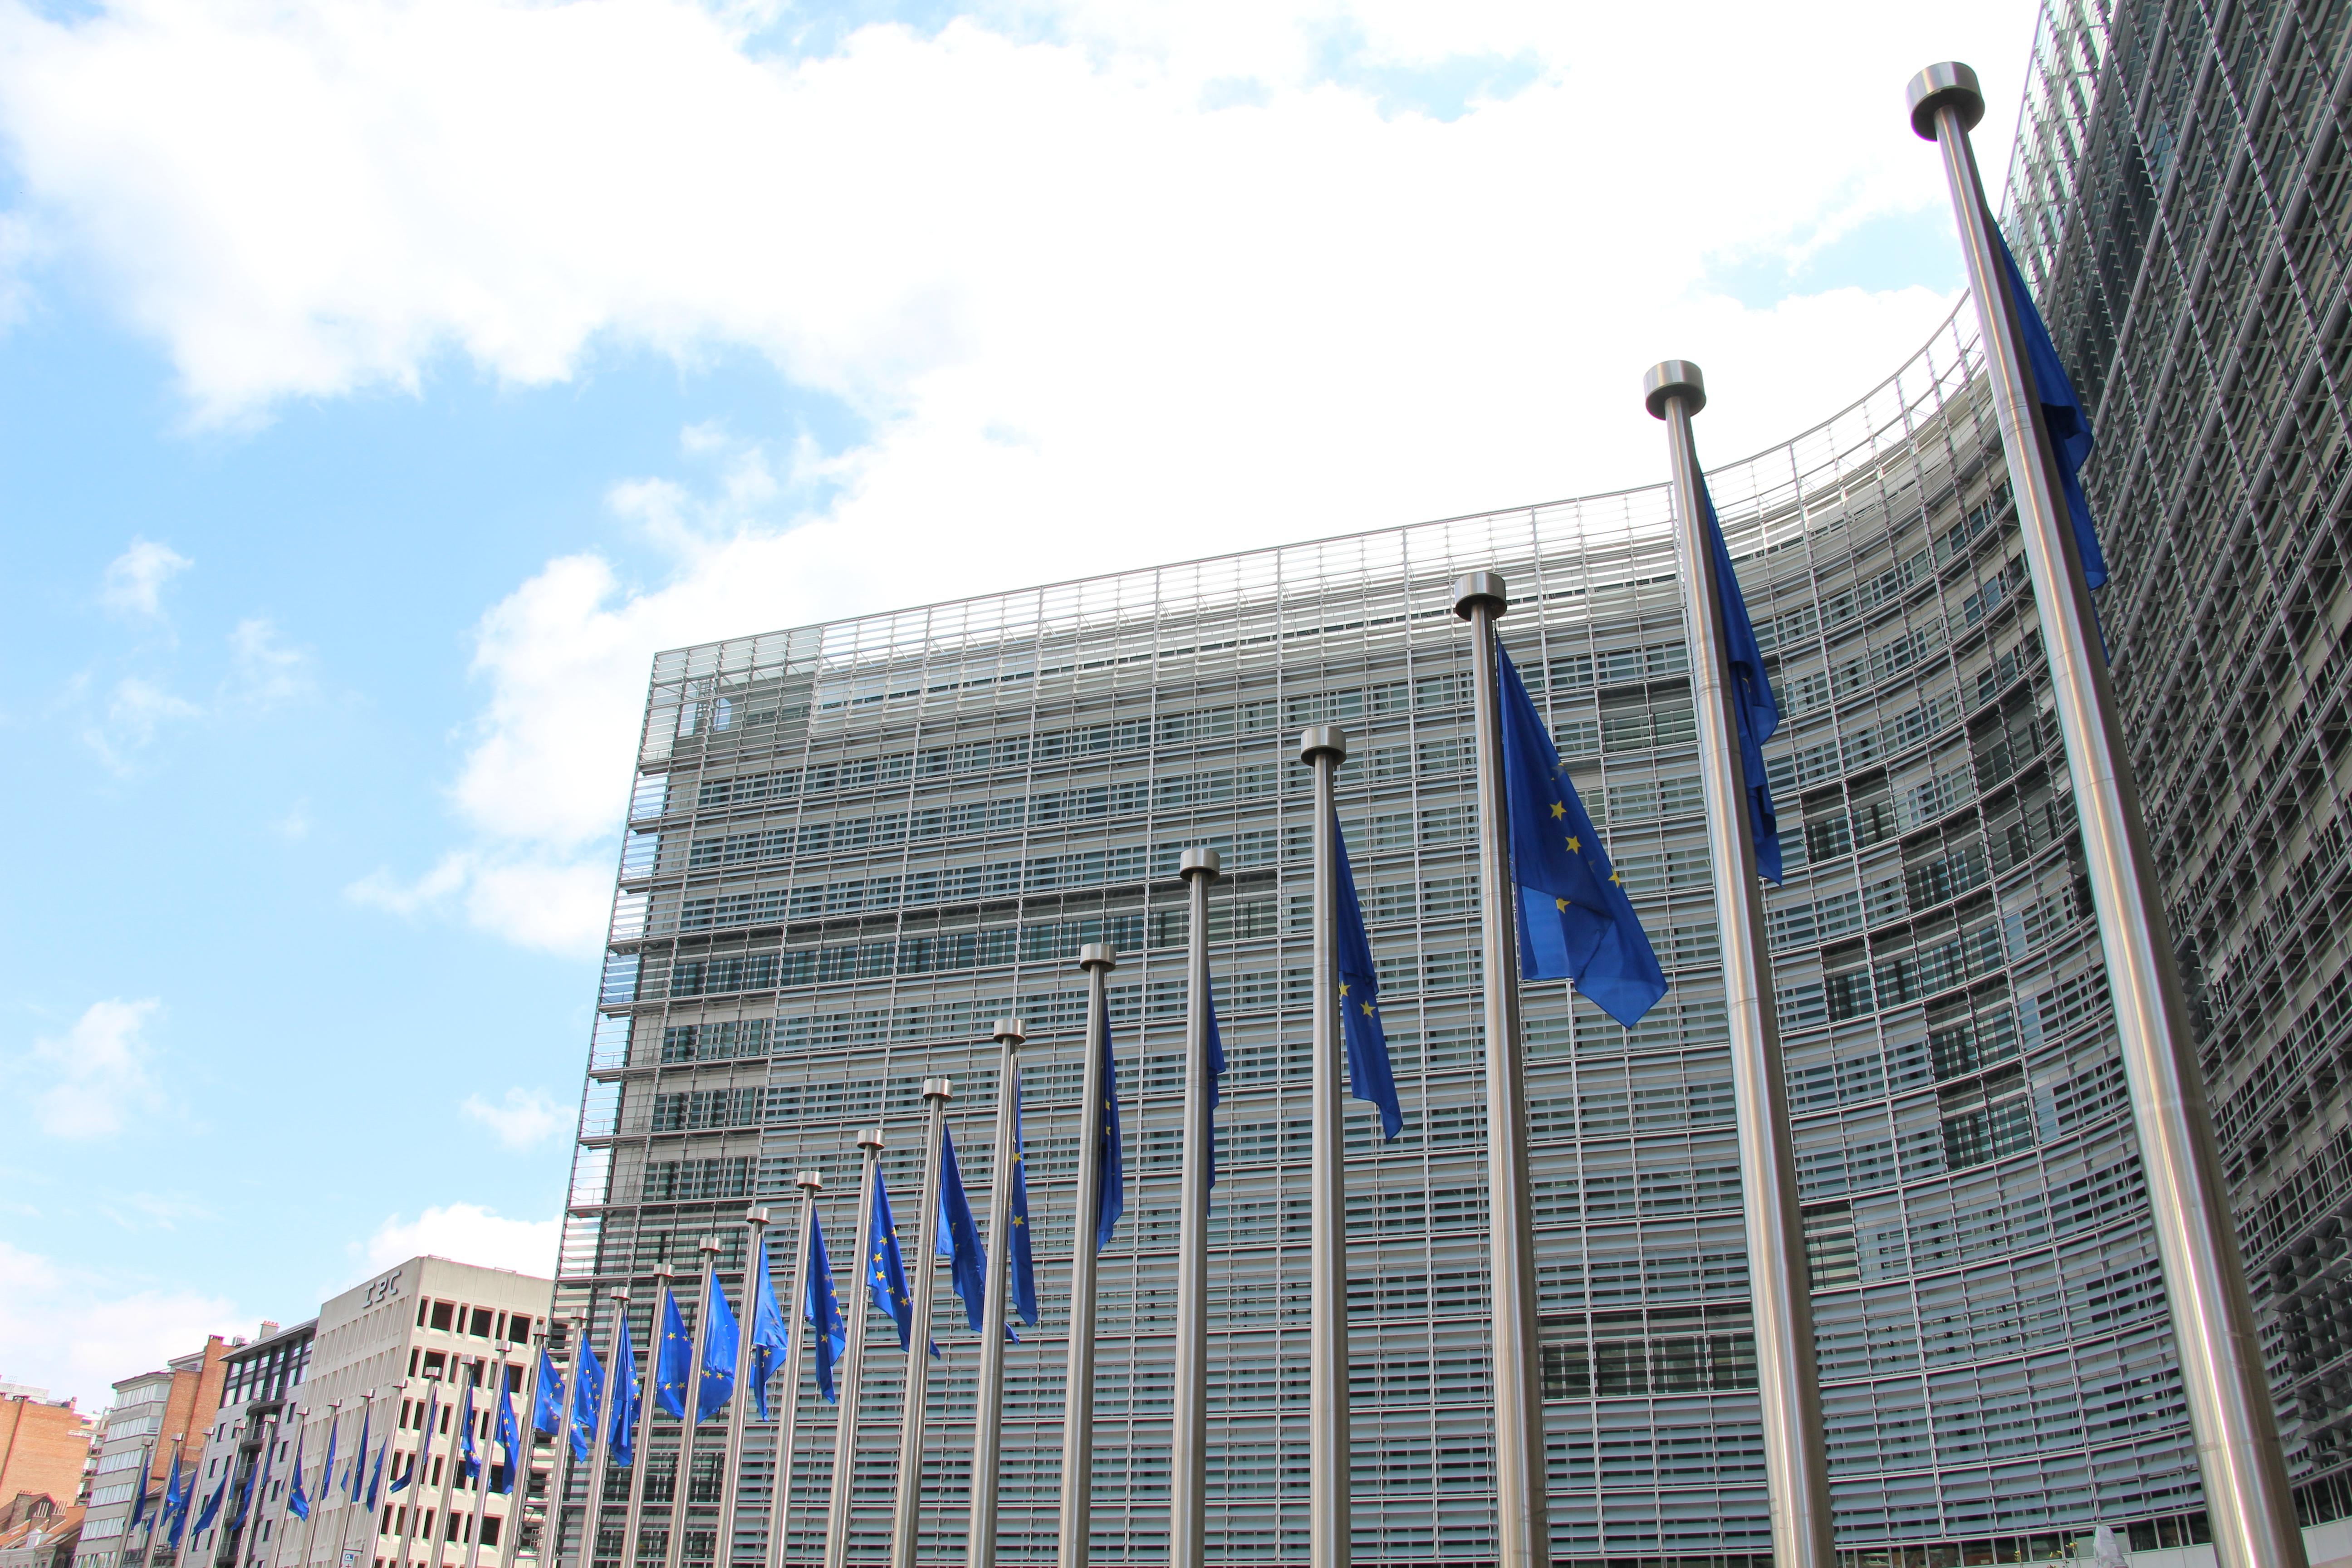 European Commission - Photo credit: Fred Romero